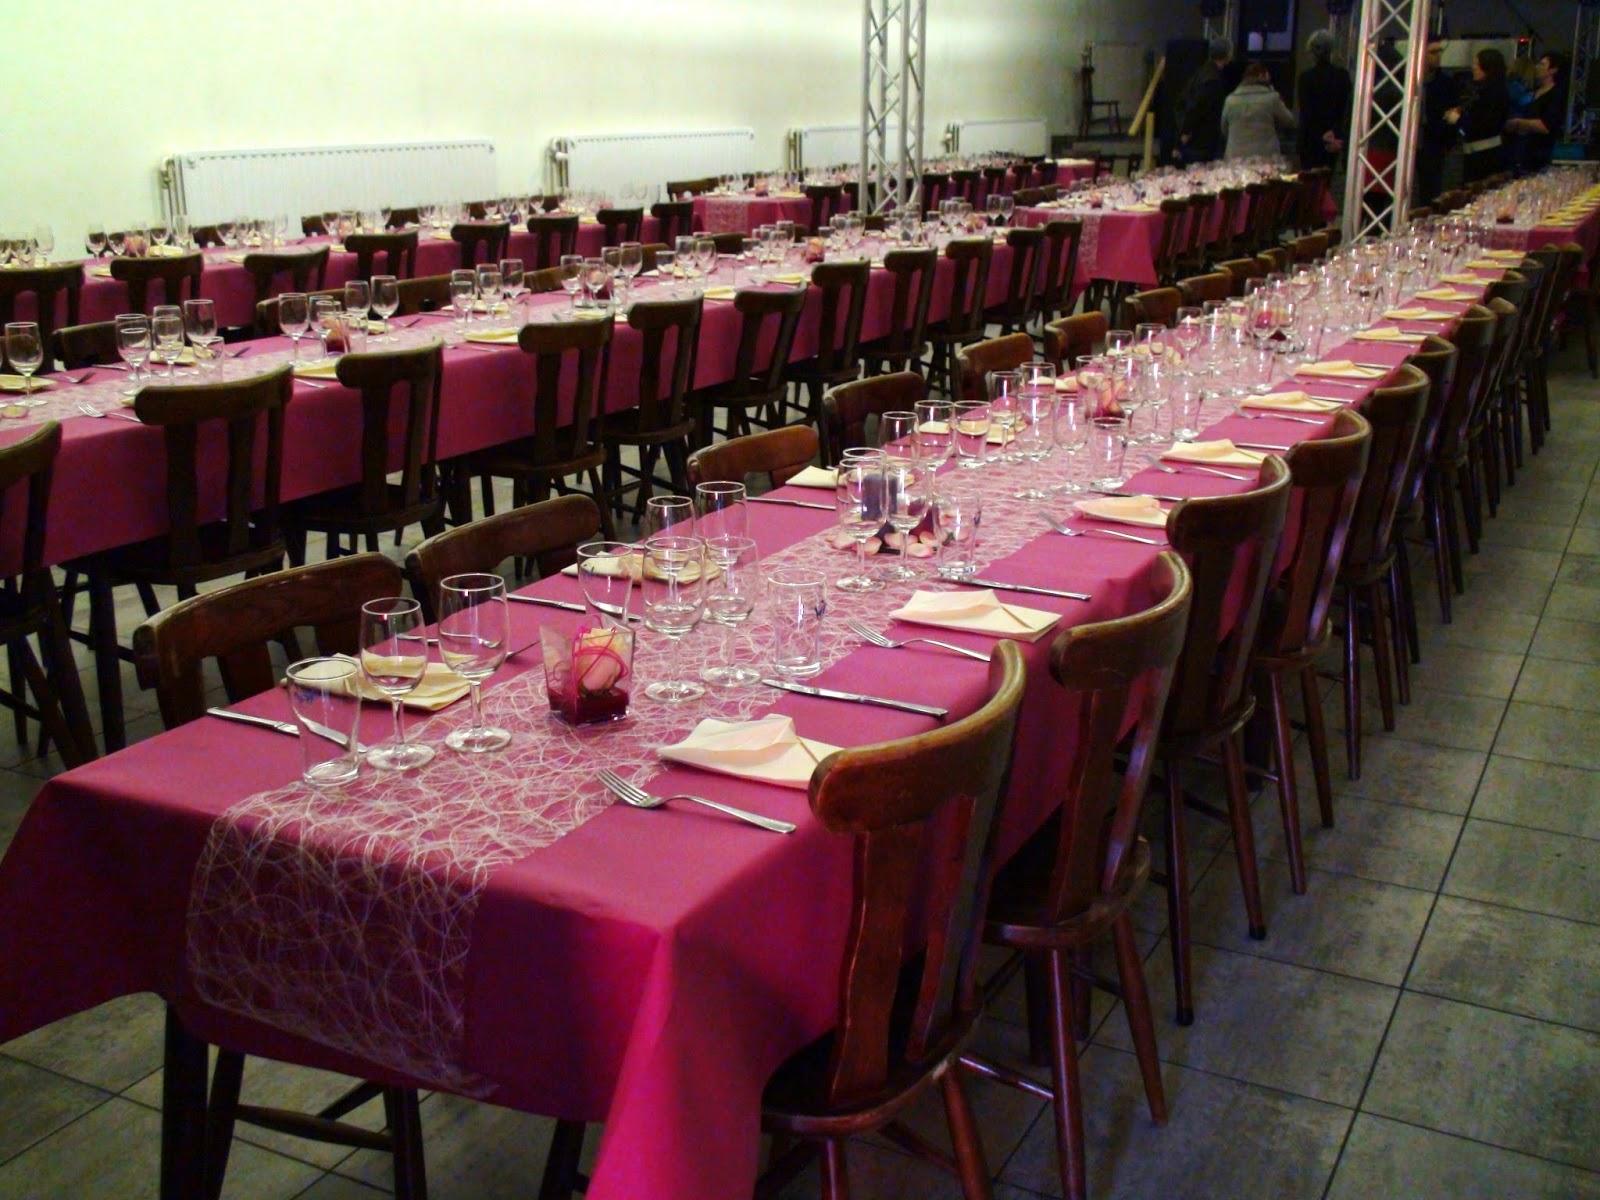 Feestelijke tafels feestelijke tafel 60 ste verjaardag zaterdag 4 februari 2012 - Feestelijke tafels ...